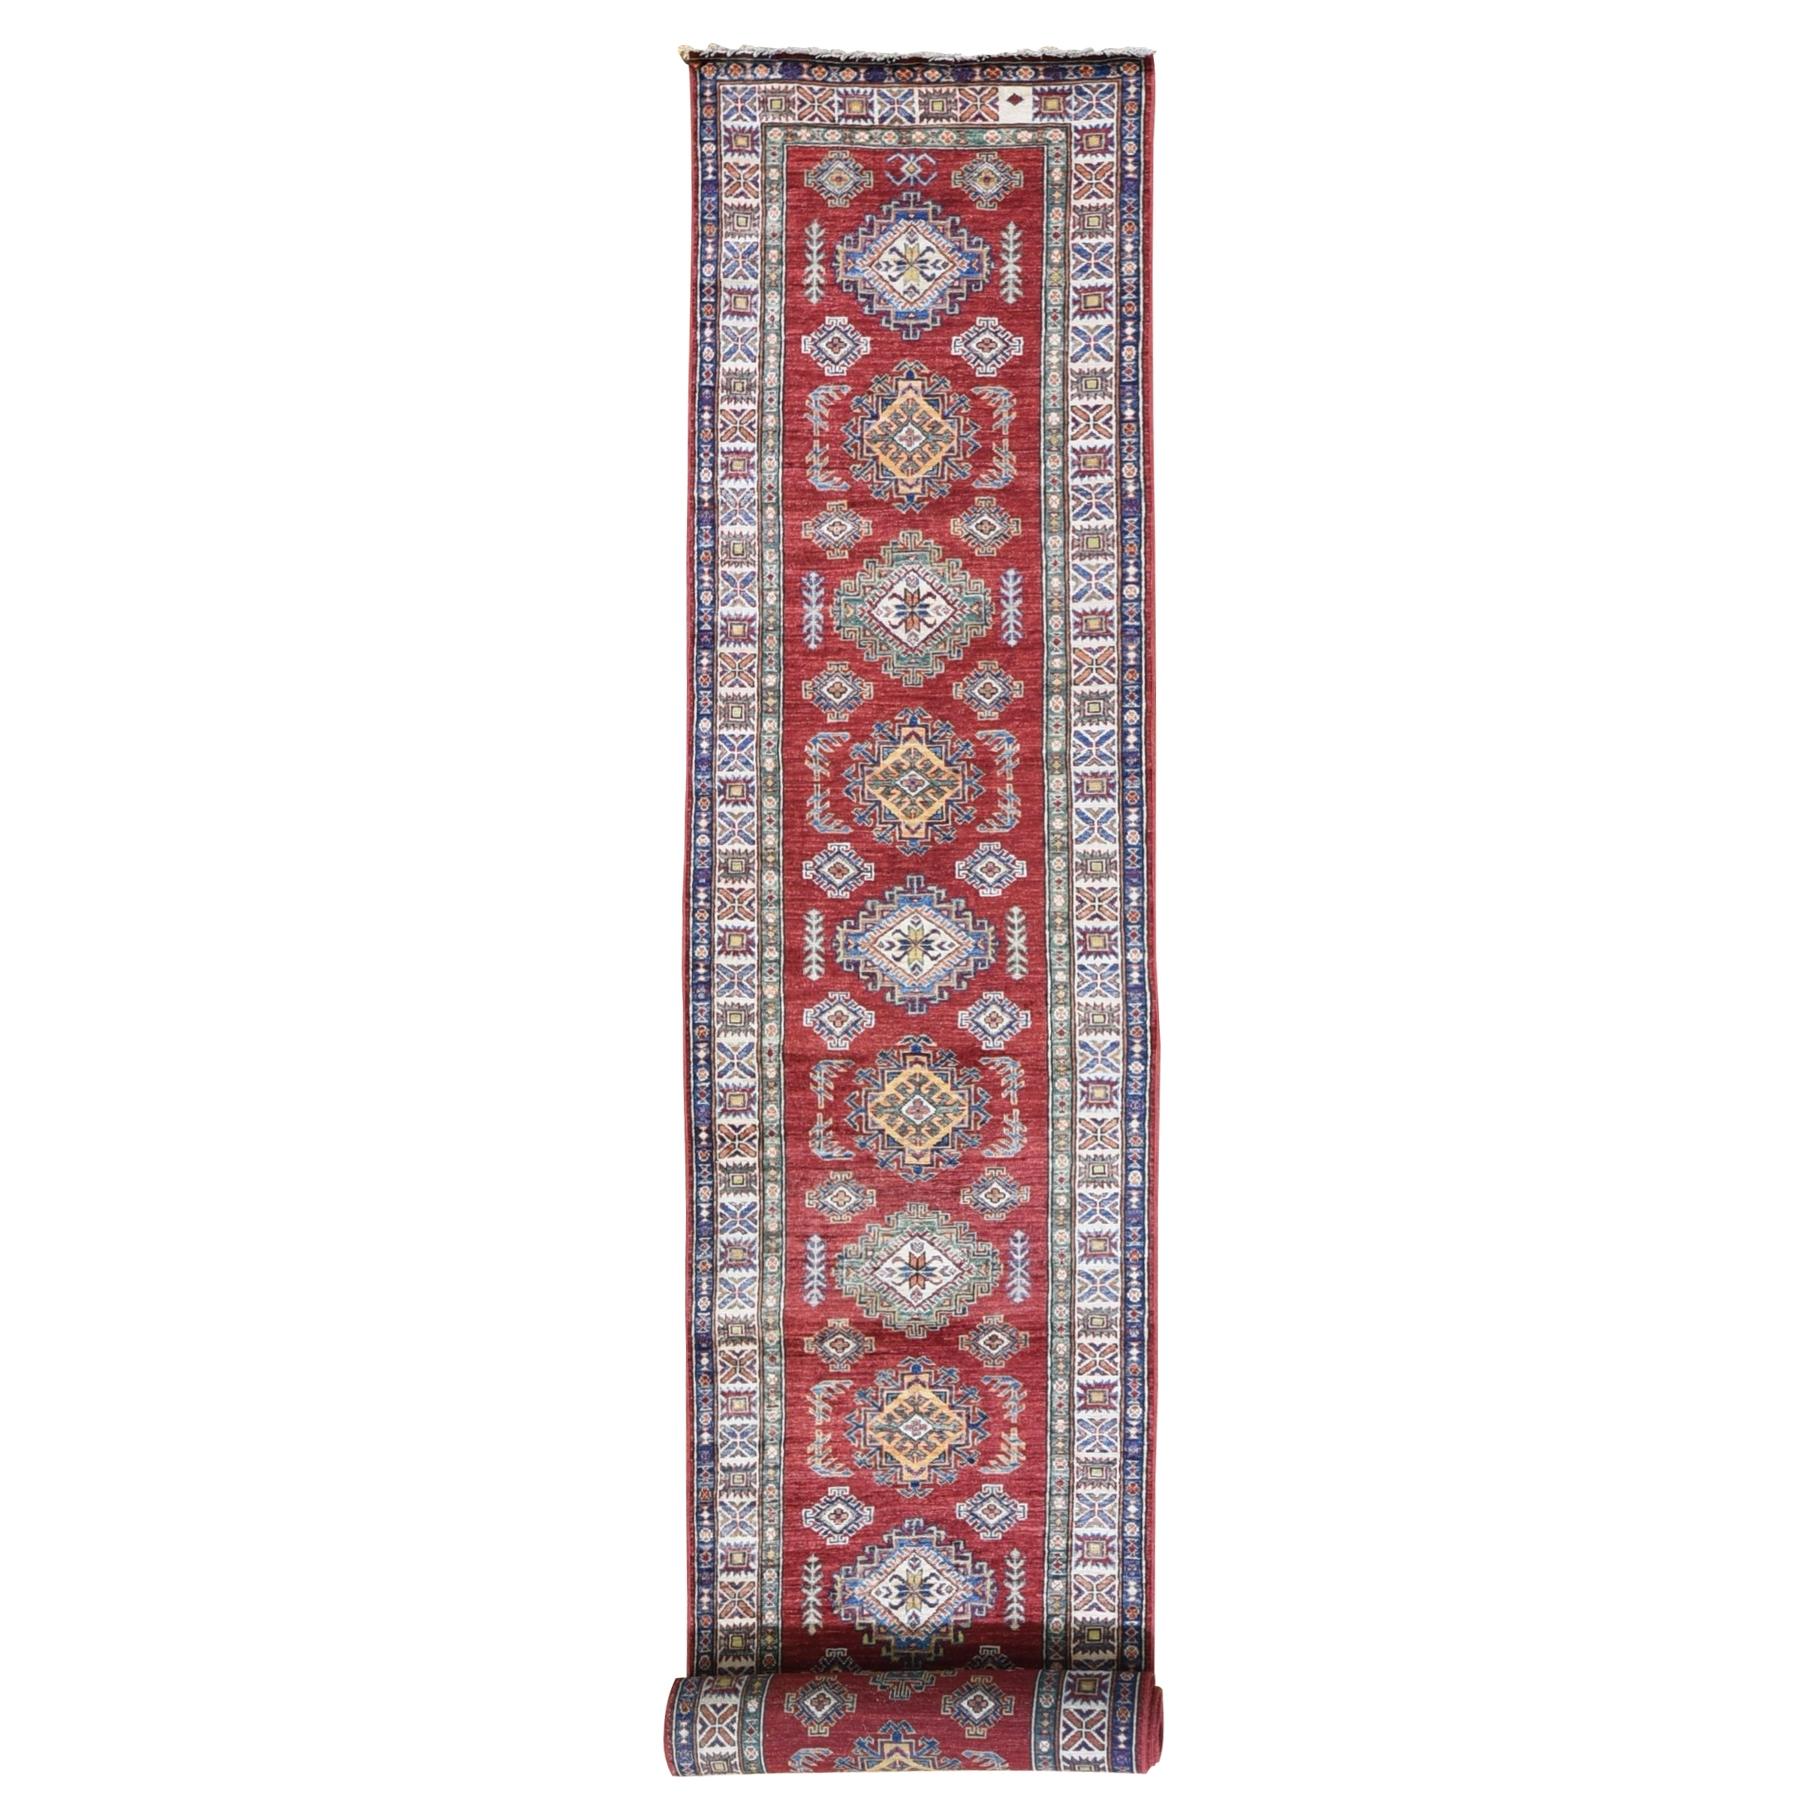 "2'9""x17'6"" Red Hand Knotted Super Kazak XL Runner Pure Wool Oriental Rug"